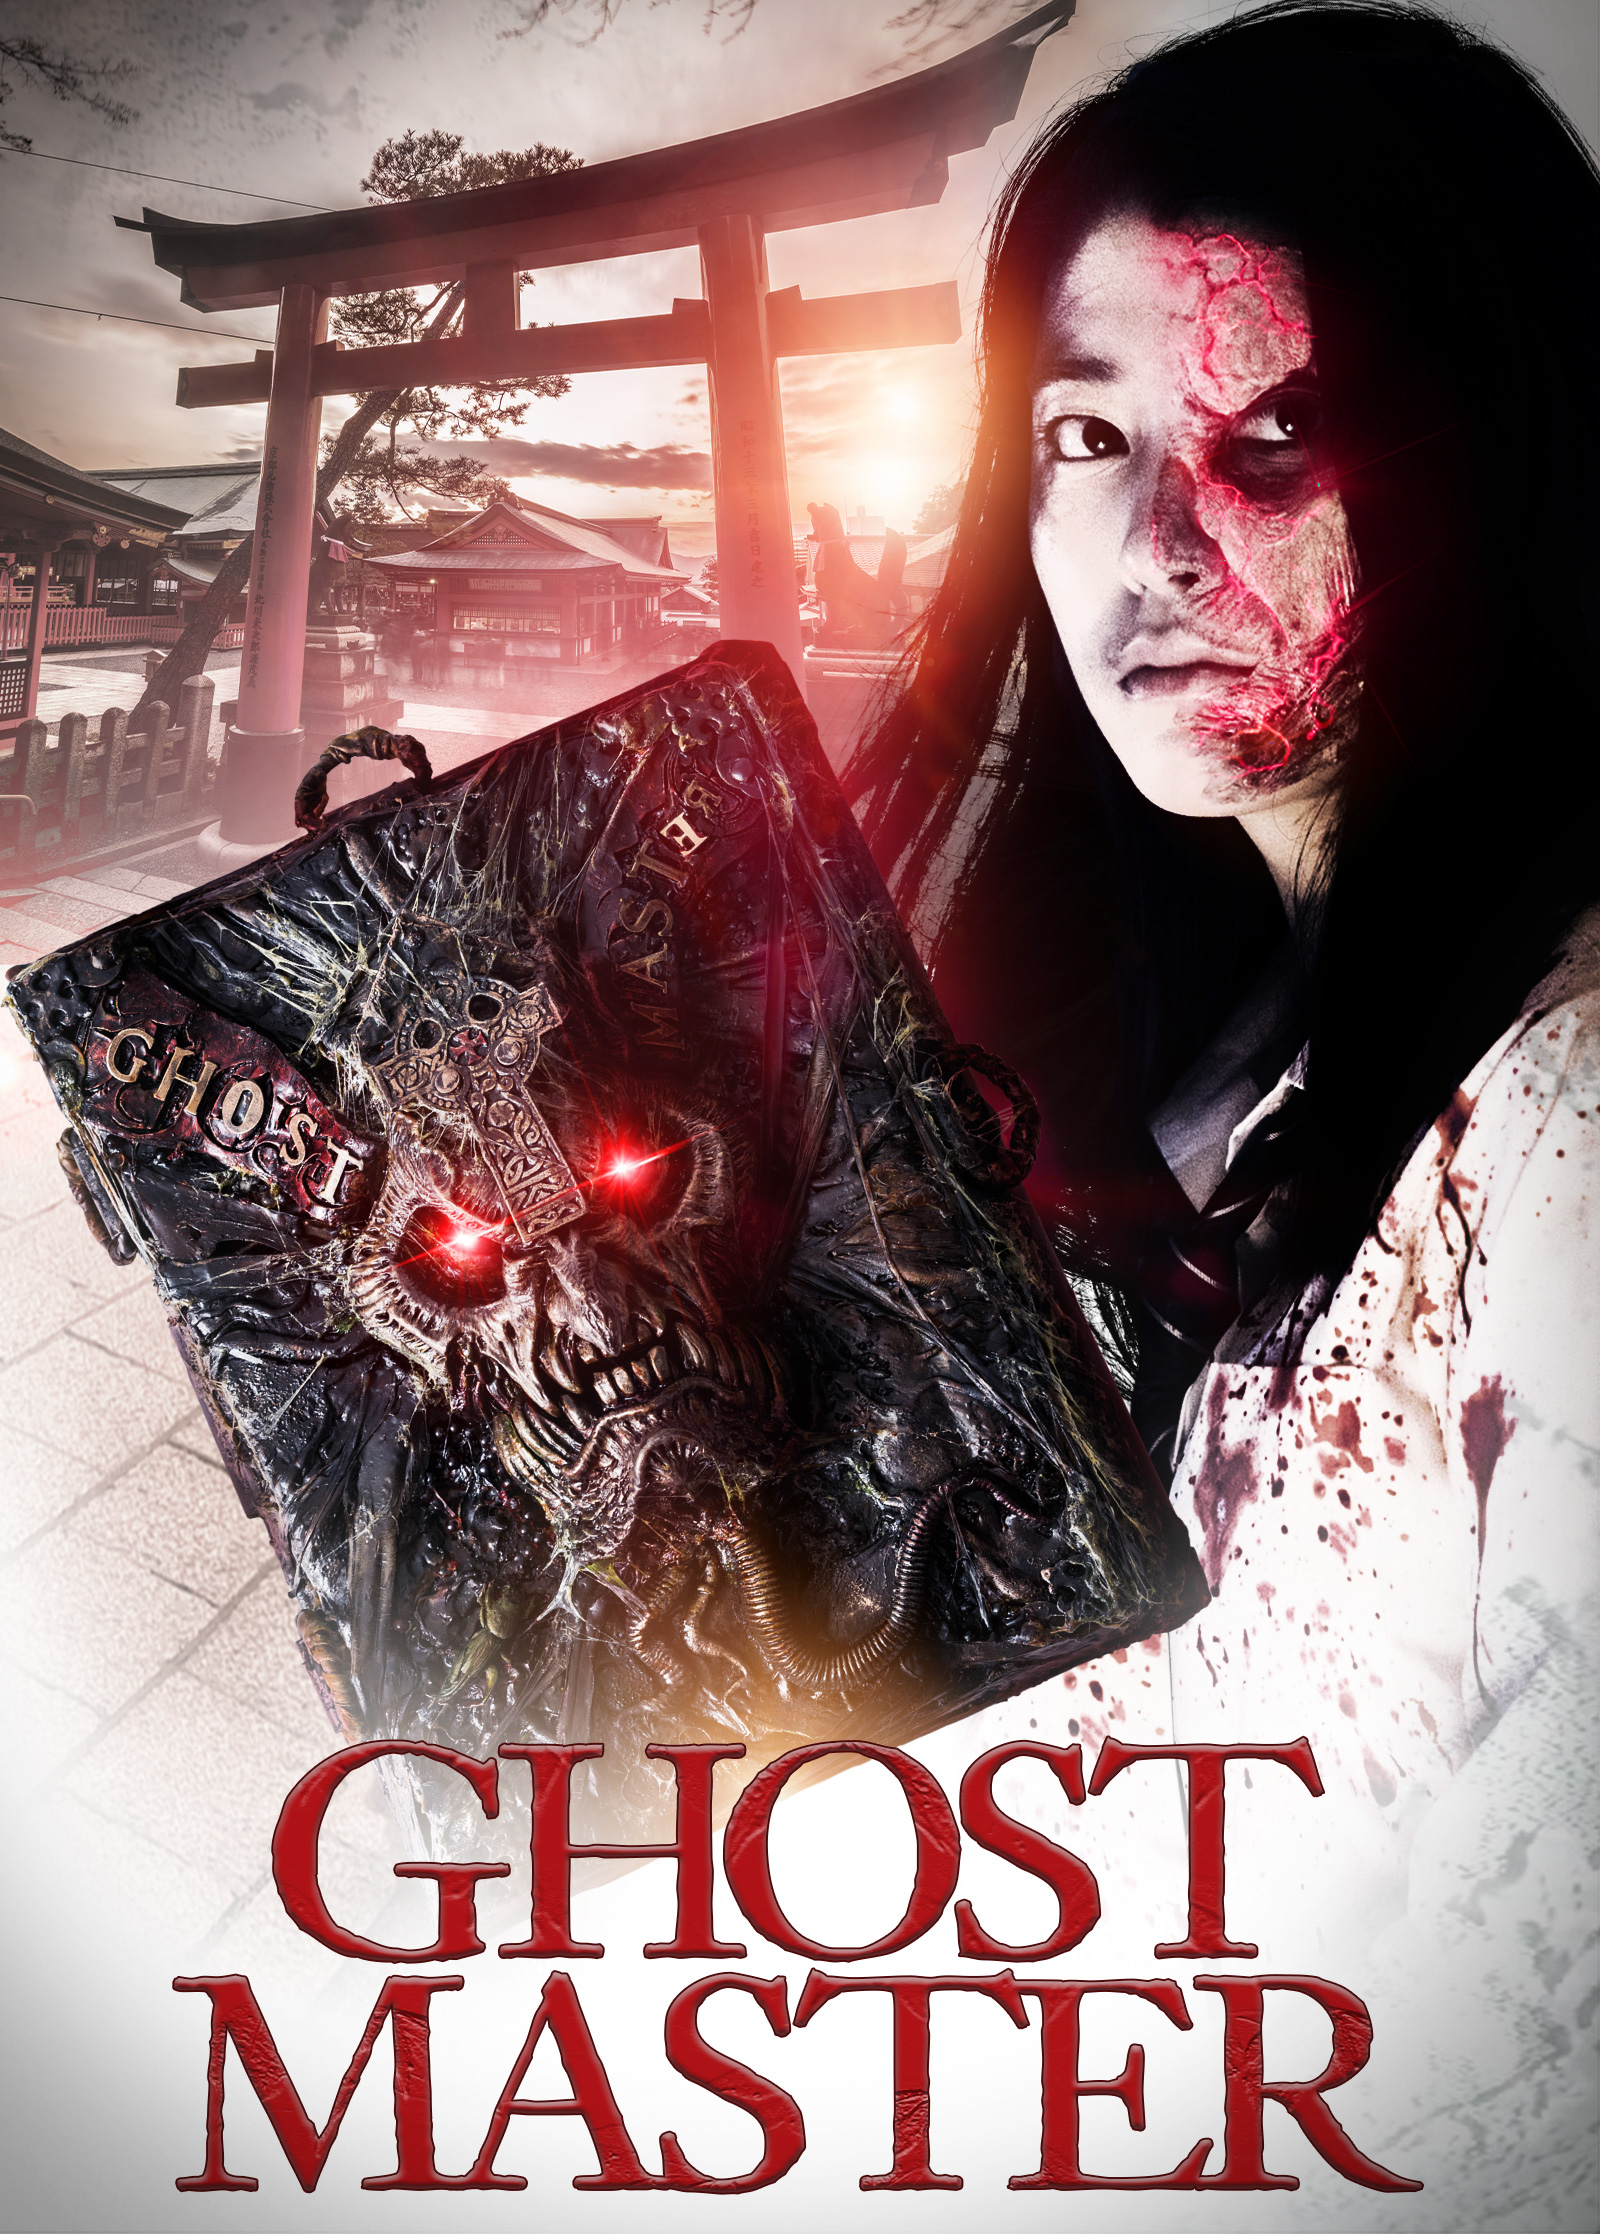 Ghost Master 2019 Imdb